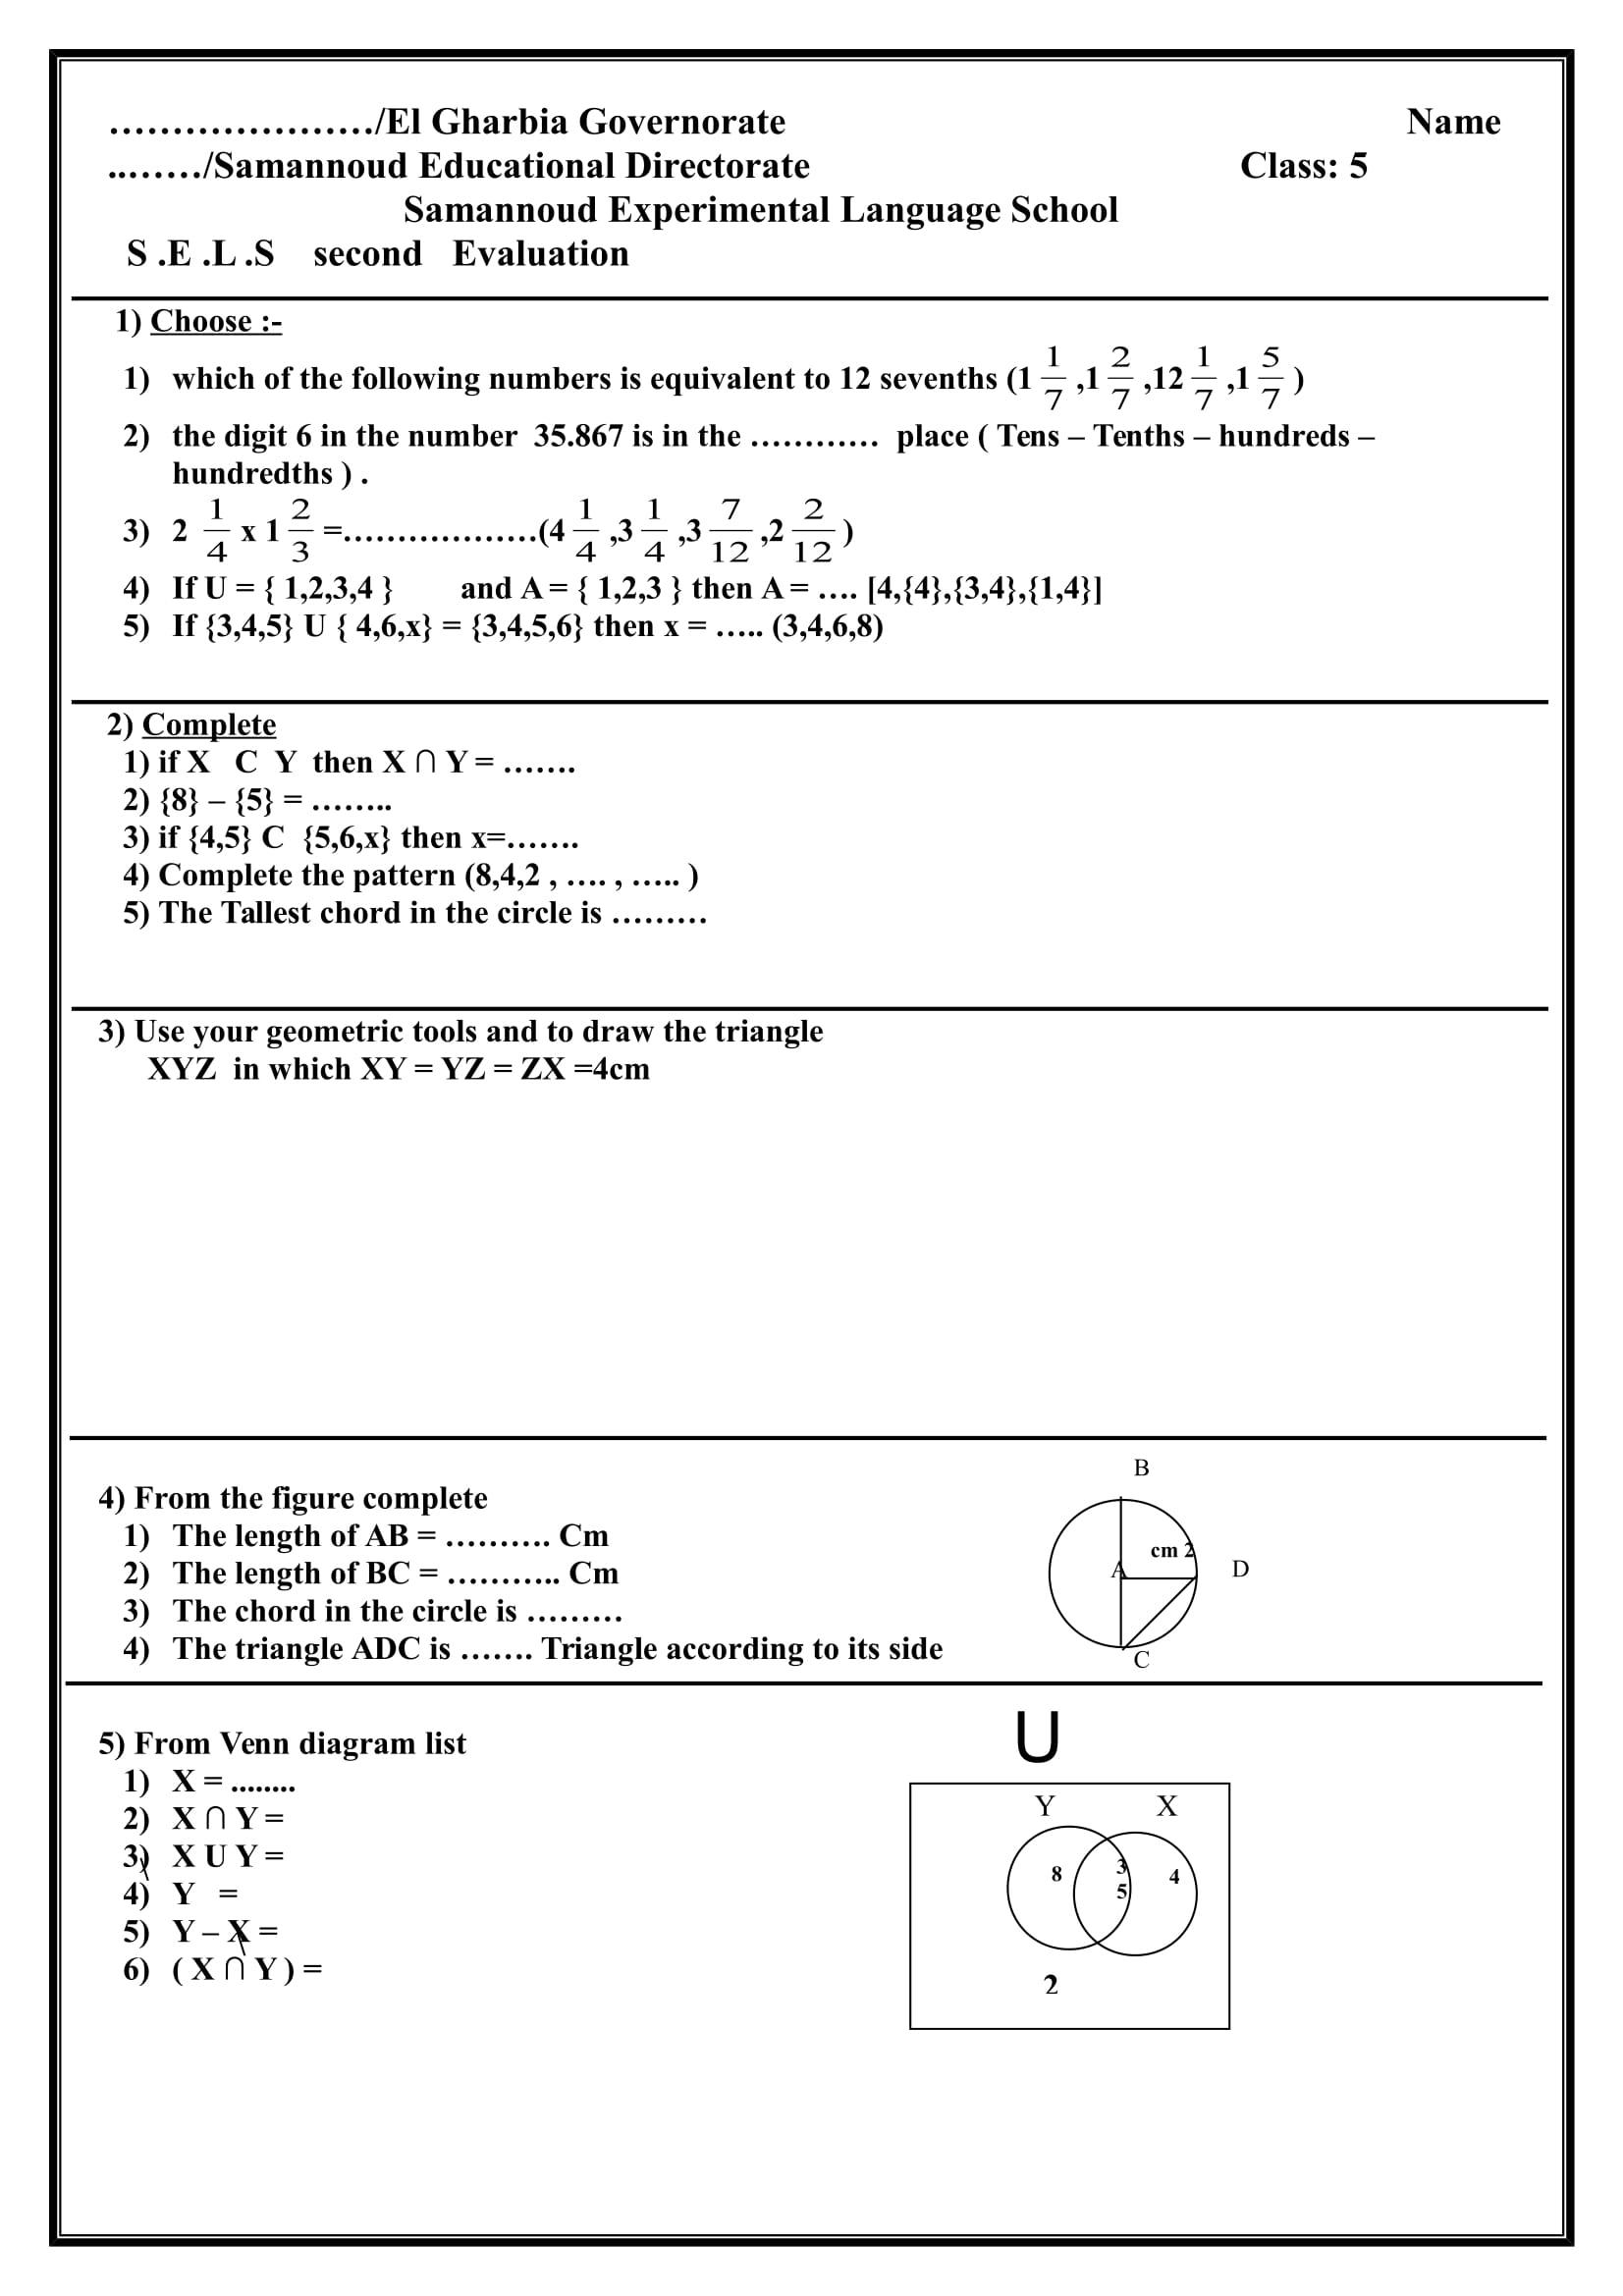 exam-eg.com_1509297199521.jpg